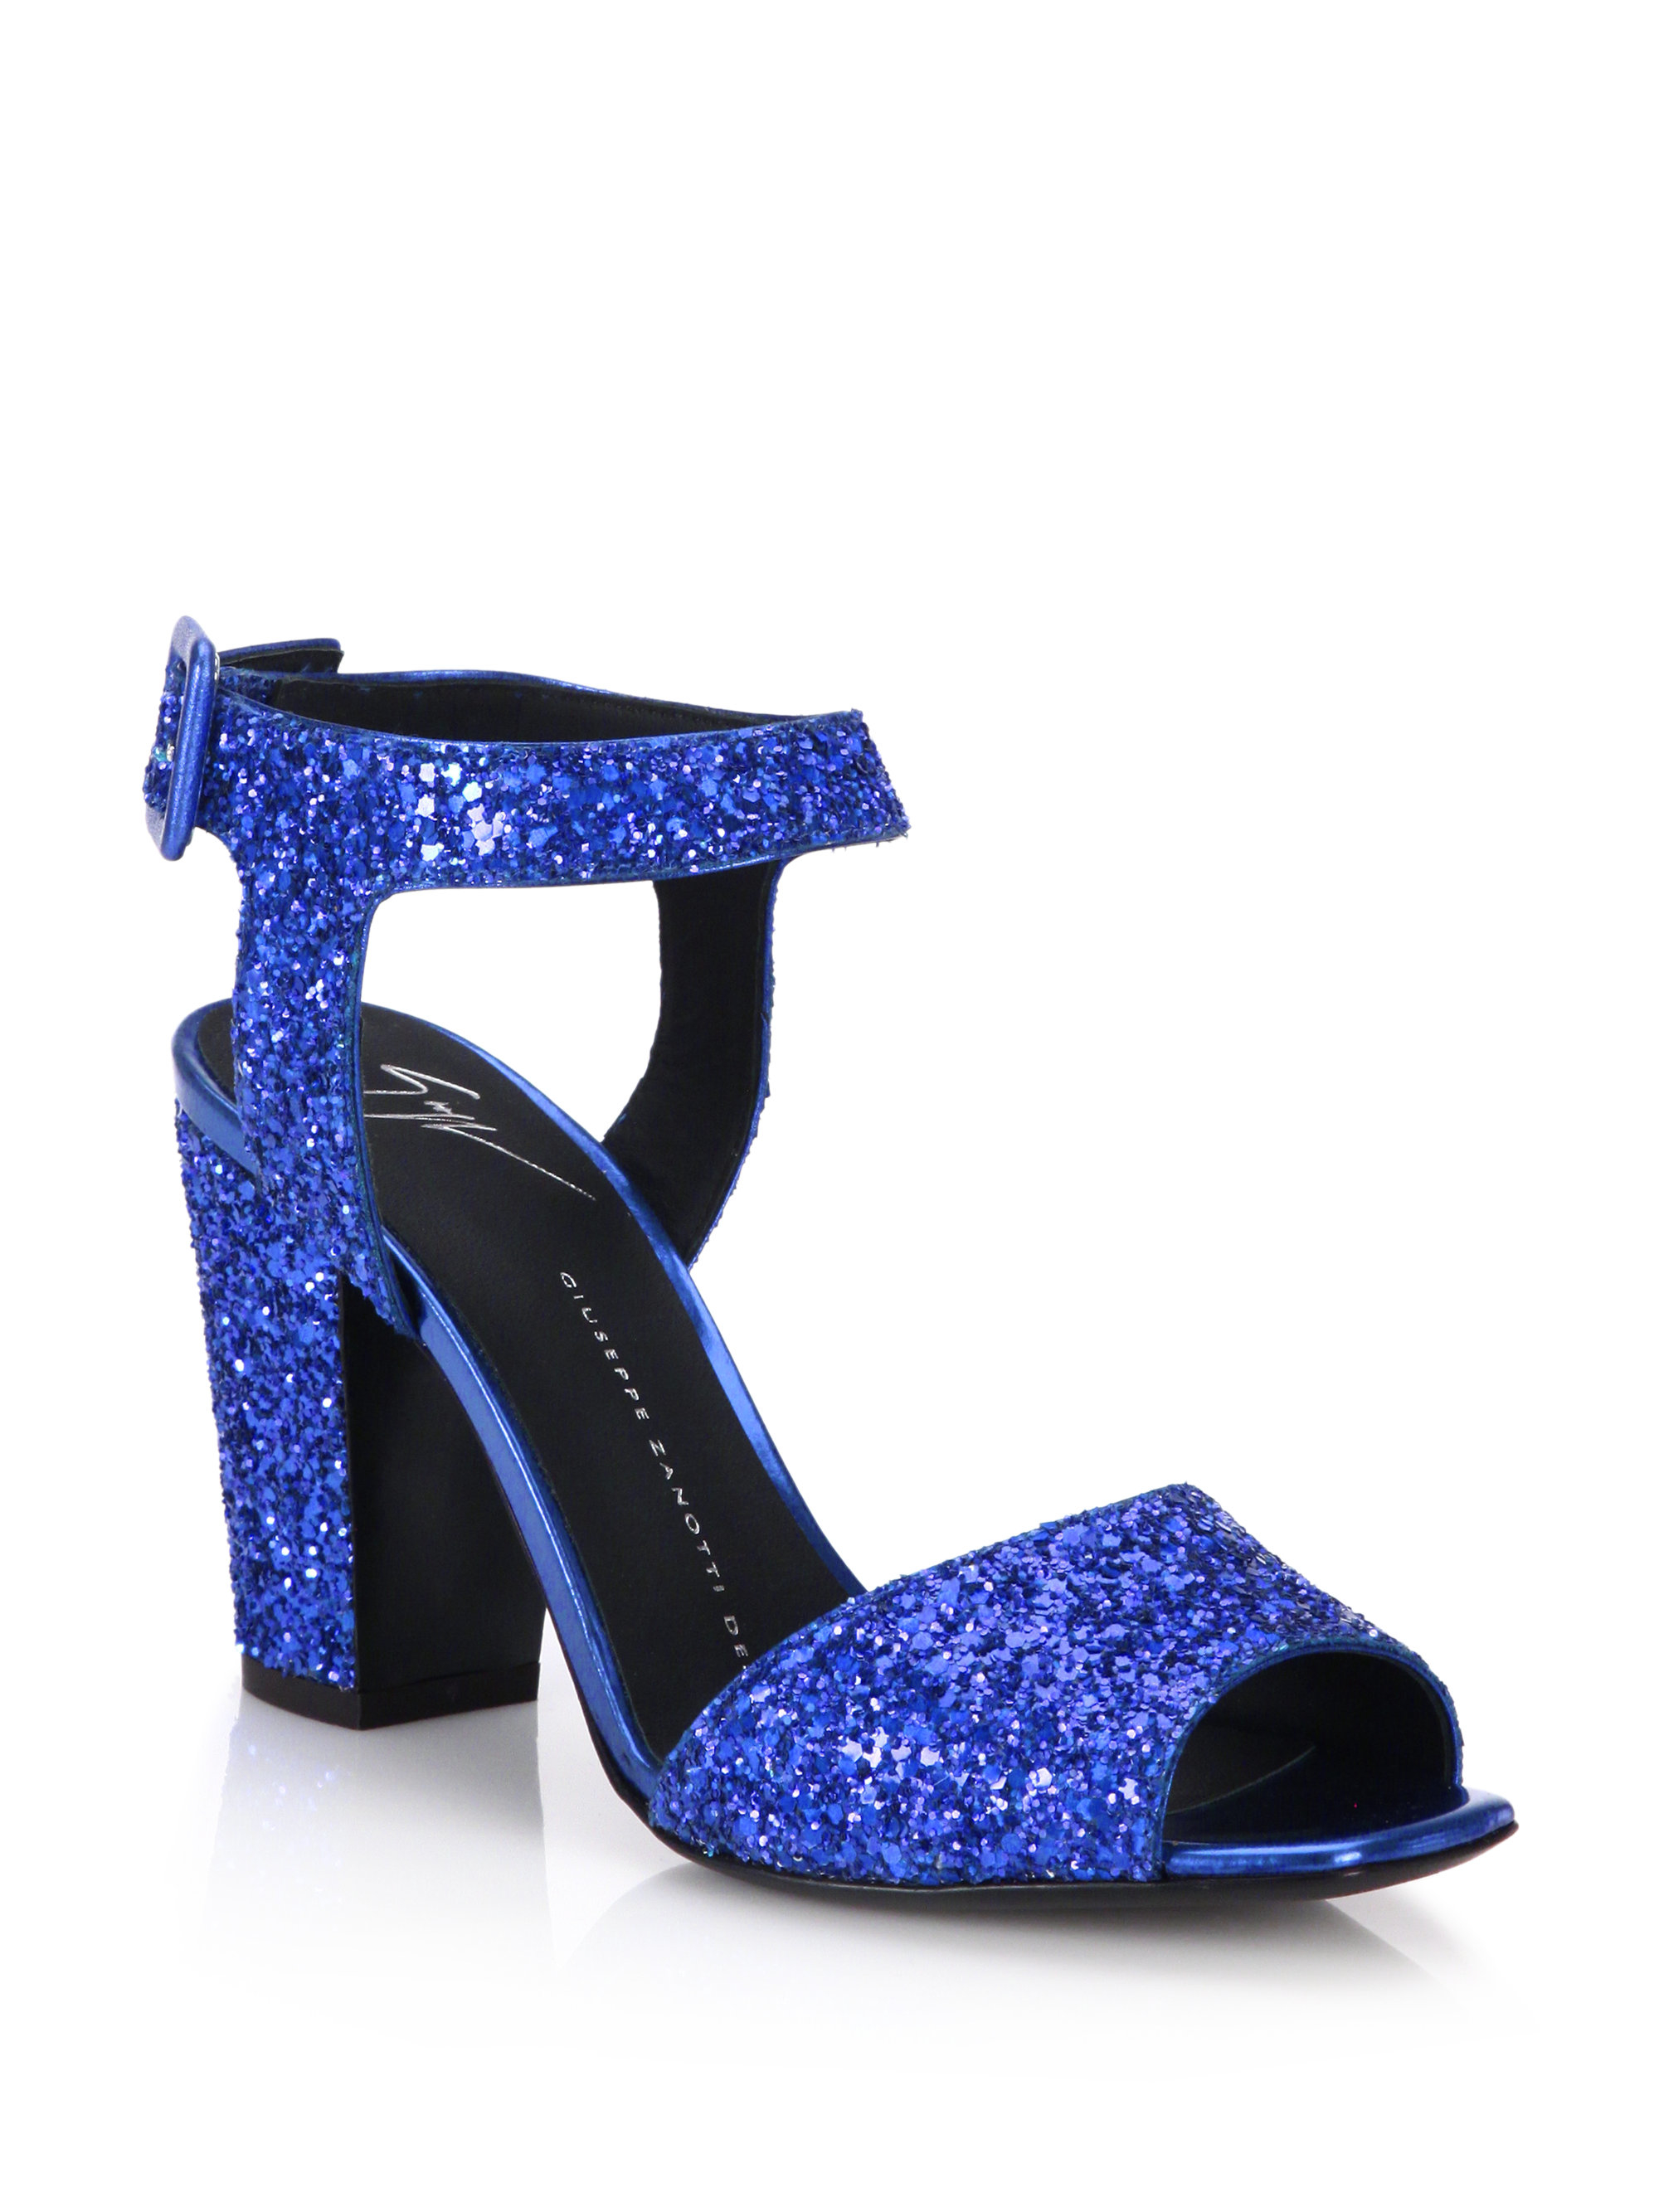 4327c45a359a Lyst - Giuseppe Zanotti Glitter Mid-heel Sandals in Blue